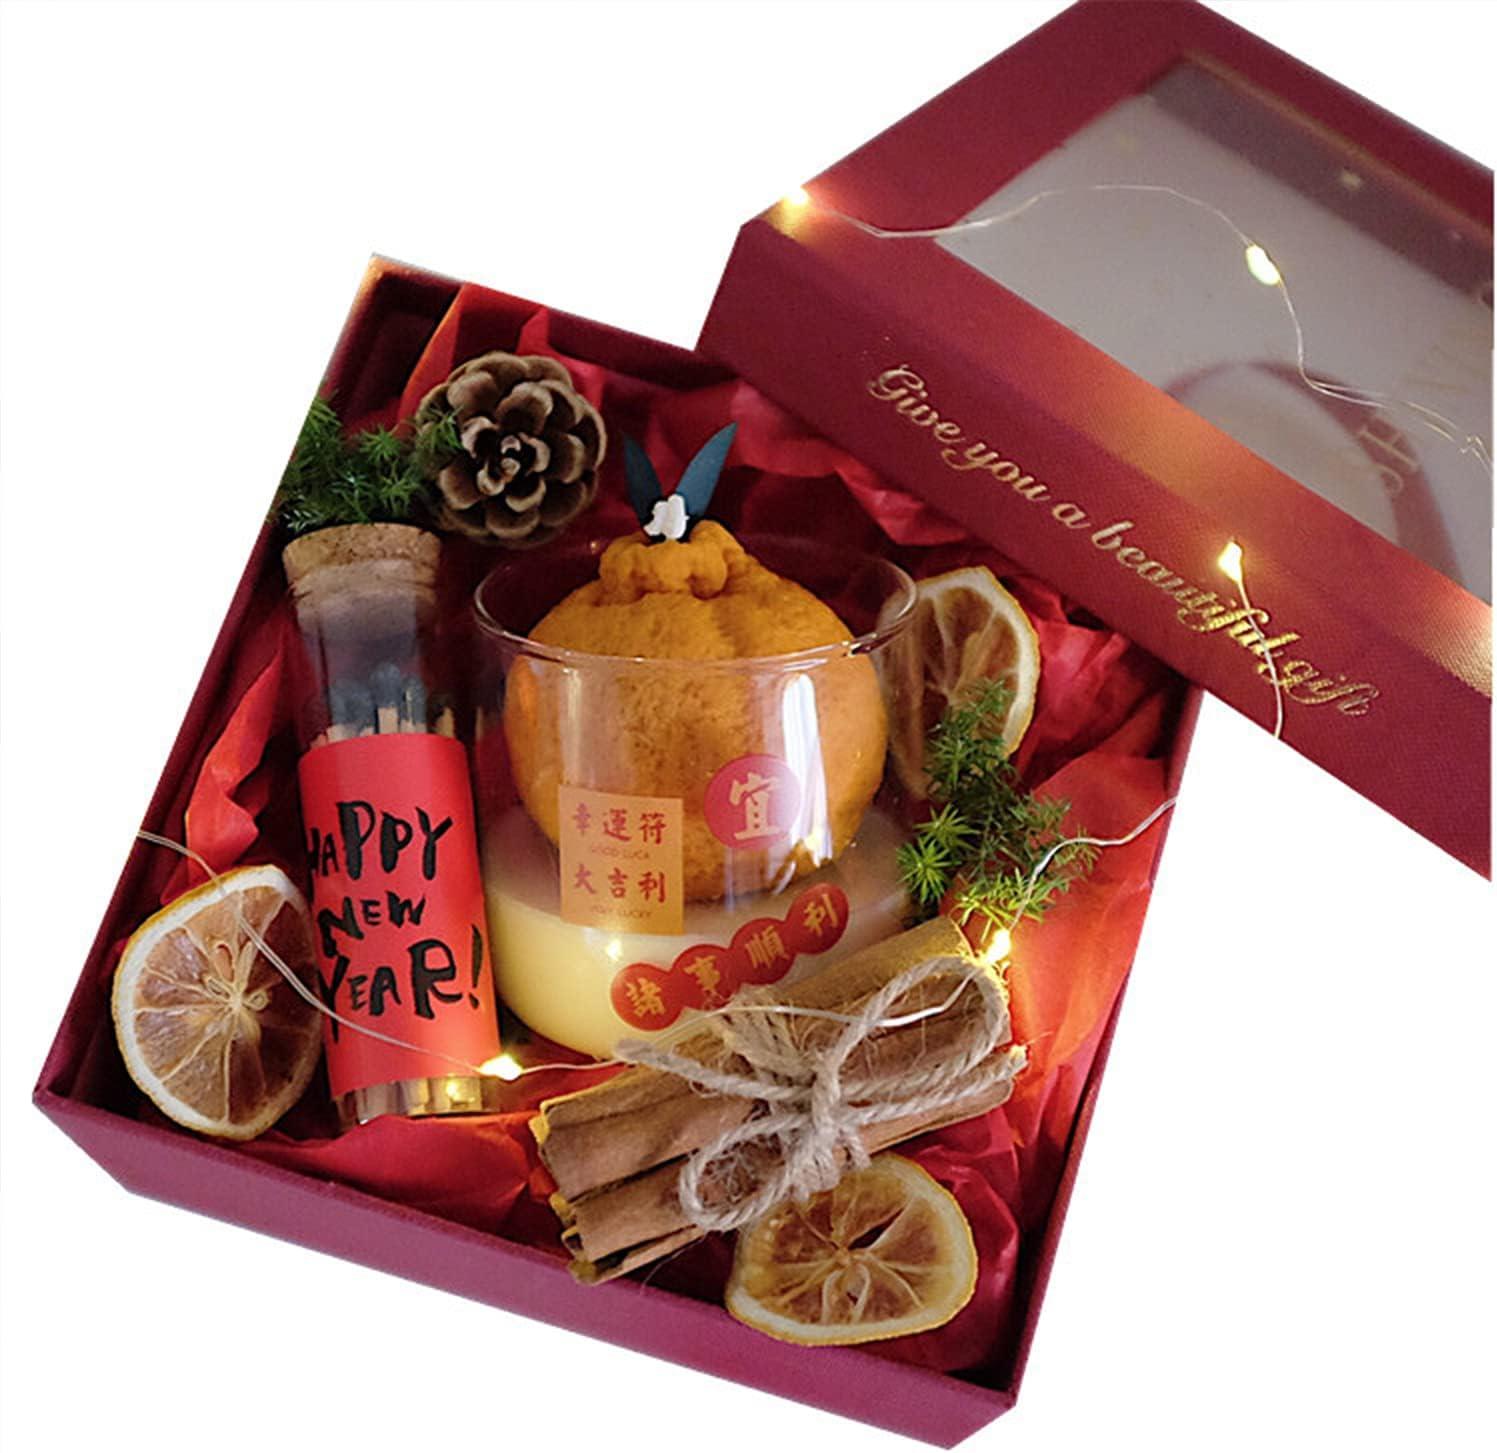 Aromatherapy Candles Good Las Vegas Long-awaited Mall Luck Aromather Kumquat Handmade Orange